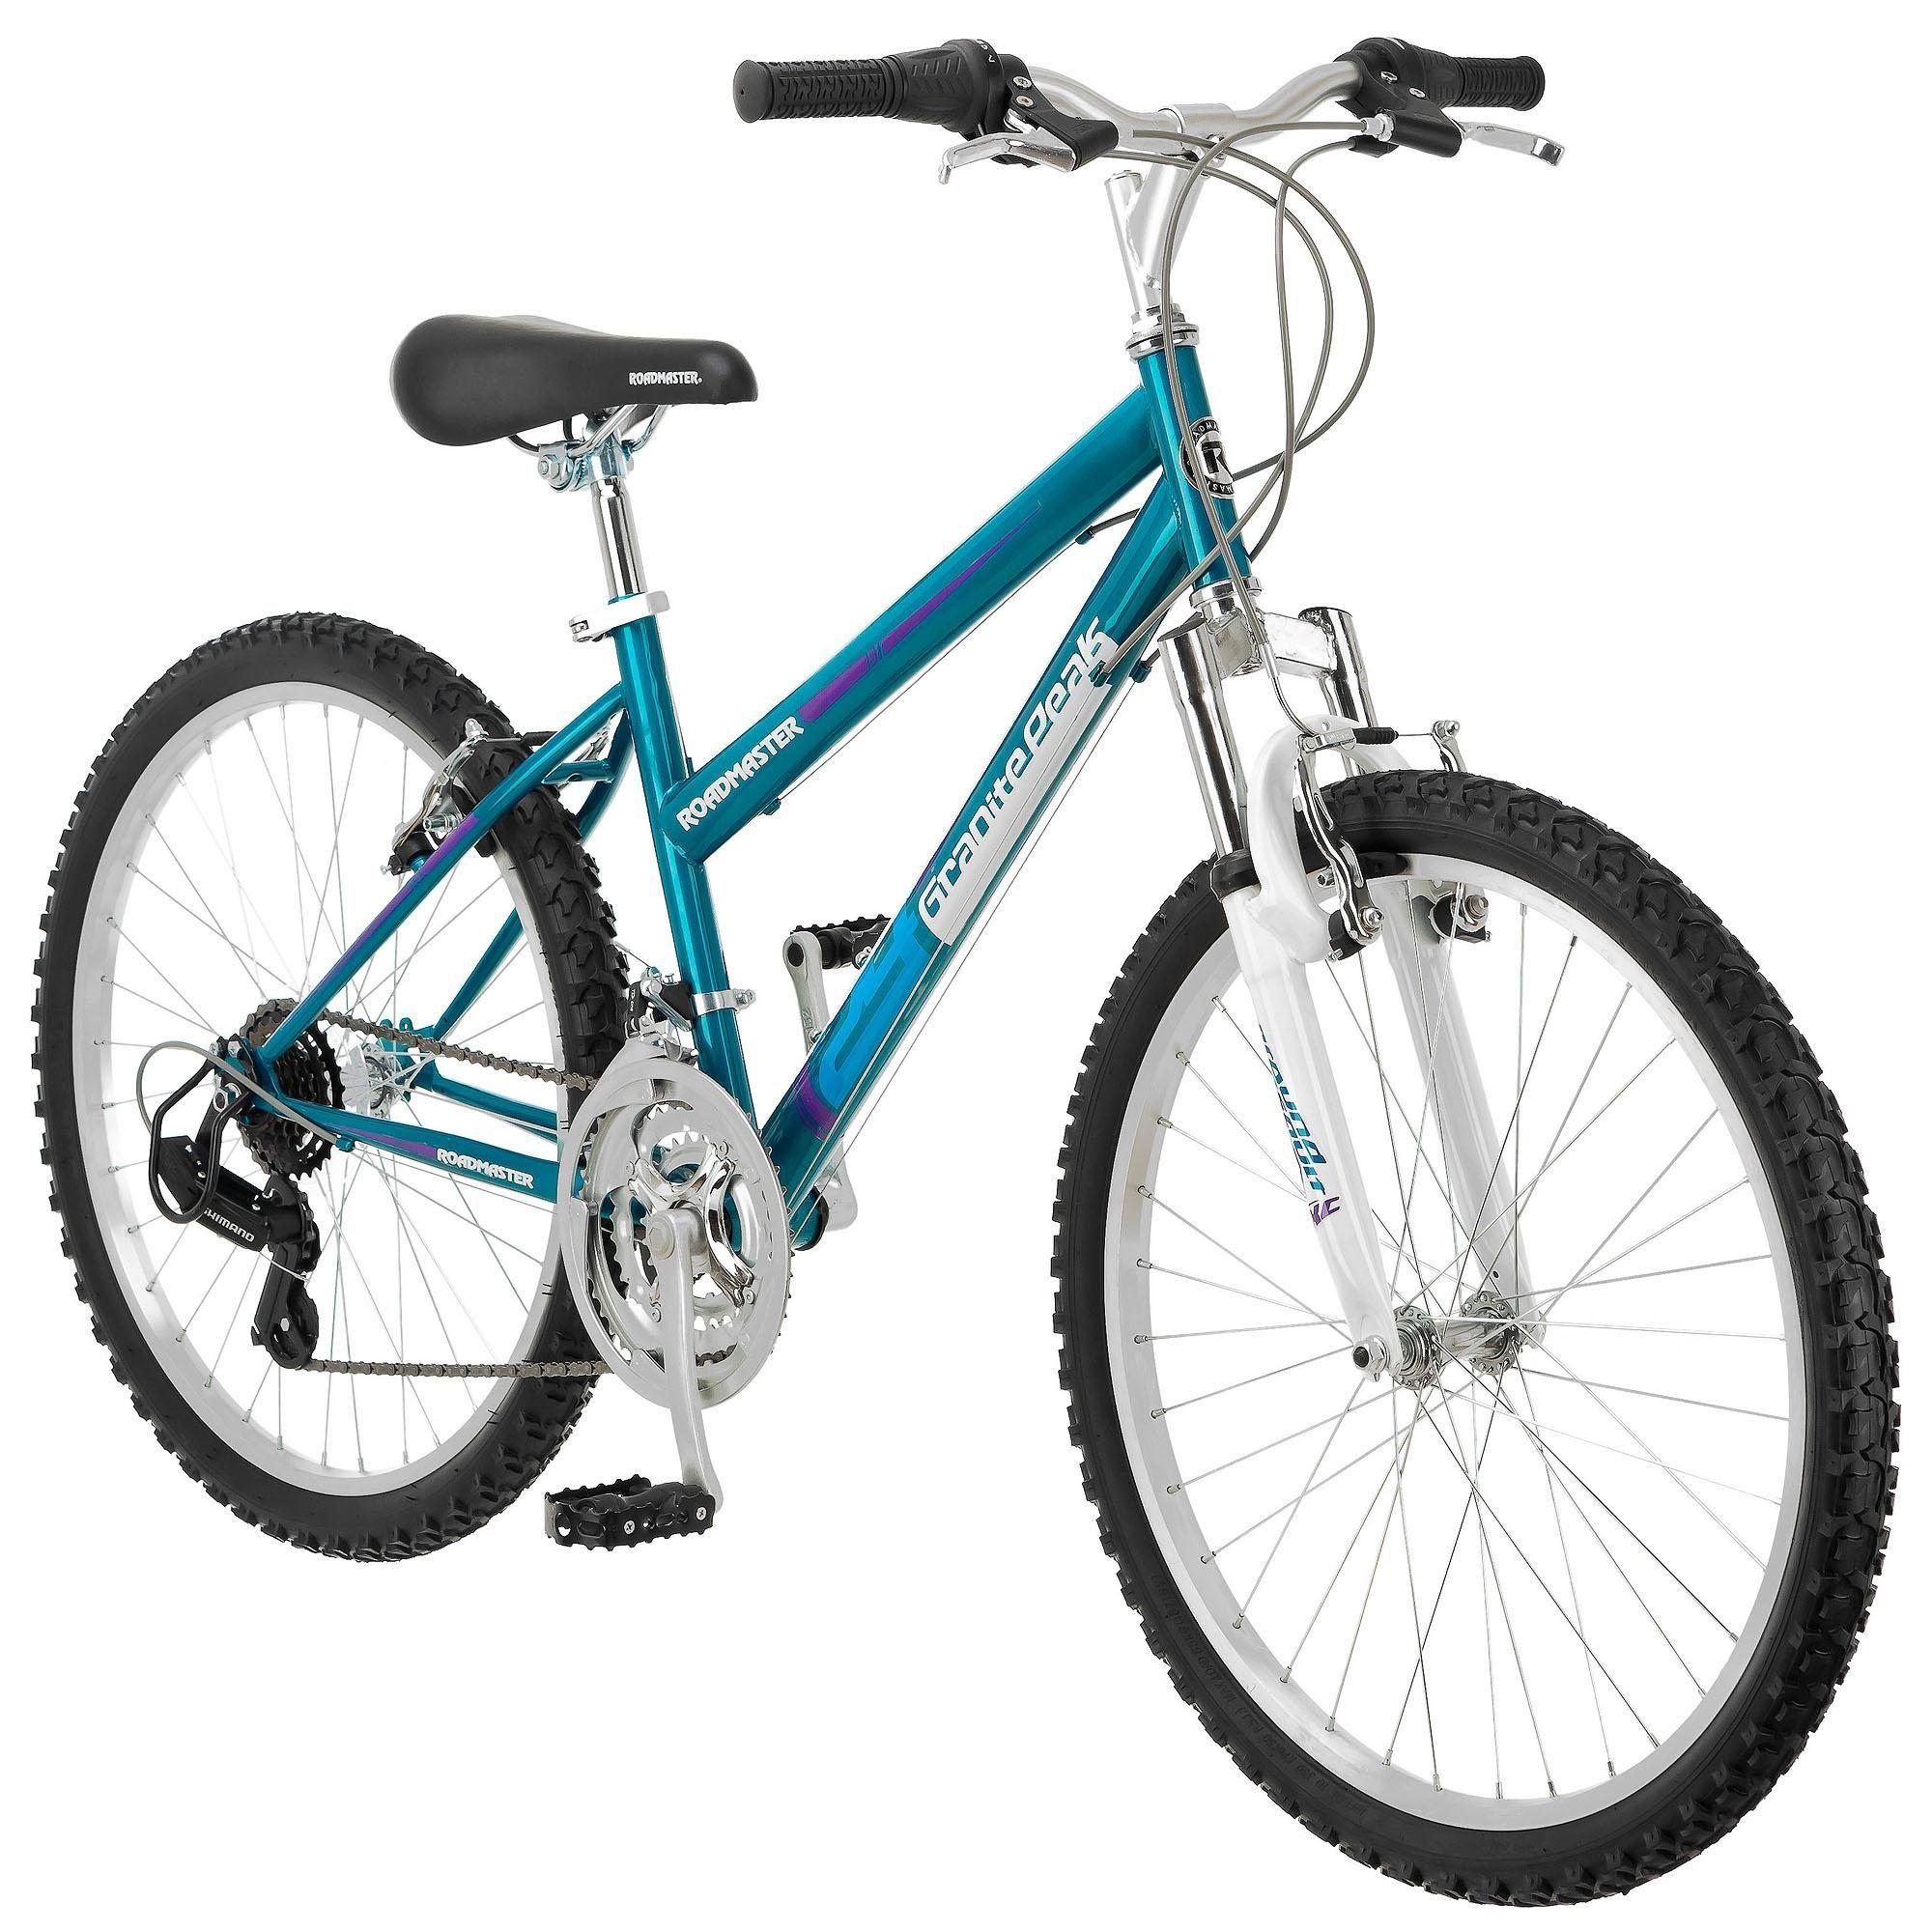 26 Roadmaster Granite Peak Women S Mountain Bike Review Mountain Bike Girls Best Mountain Bikes Mountain Bike Reviews